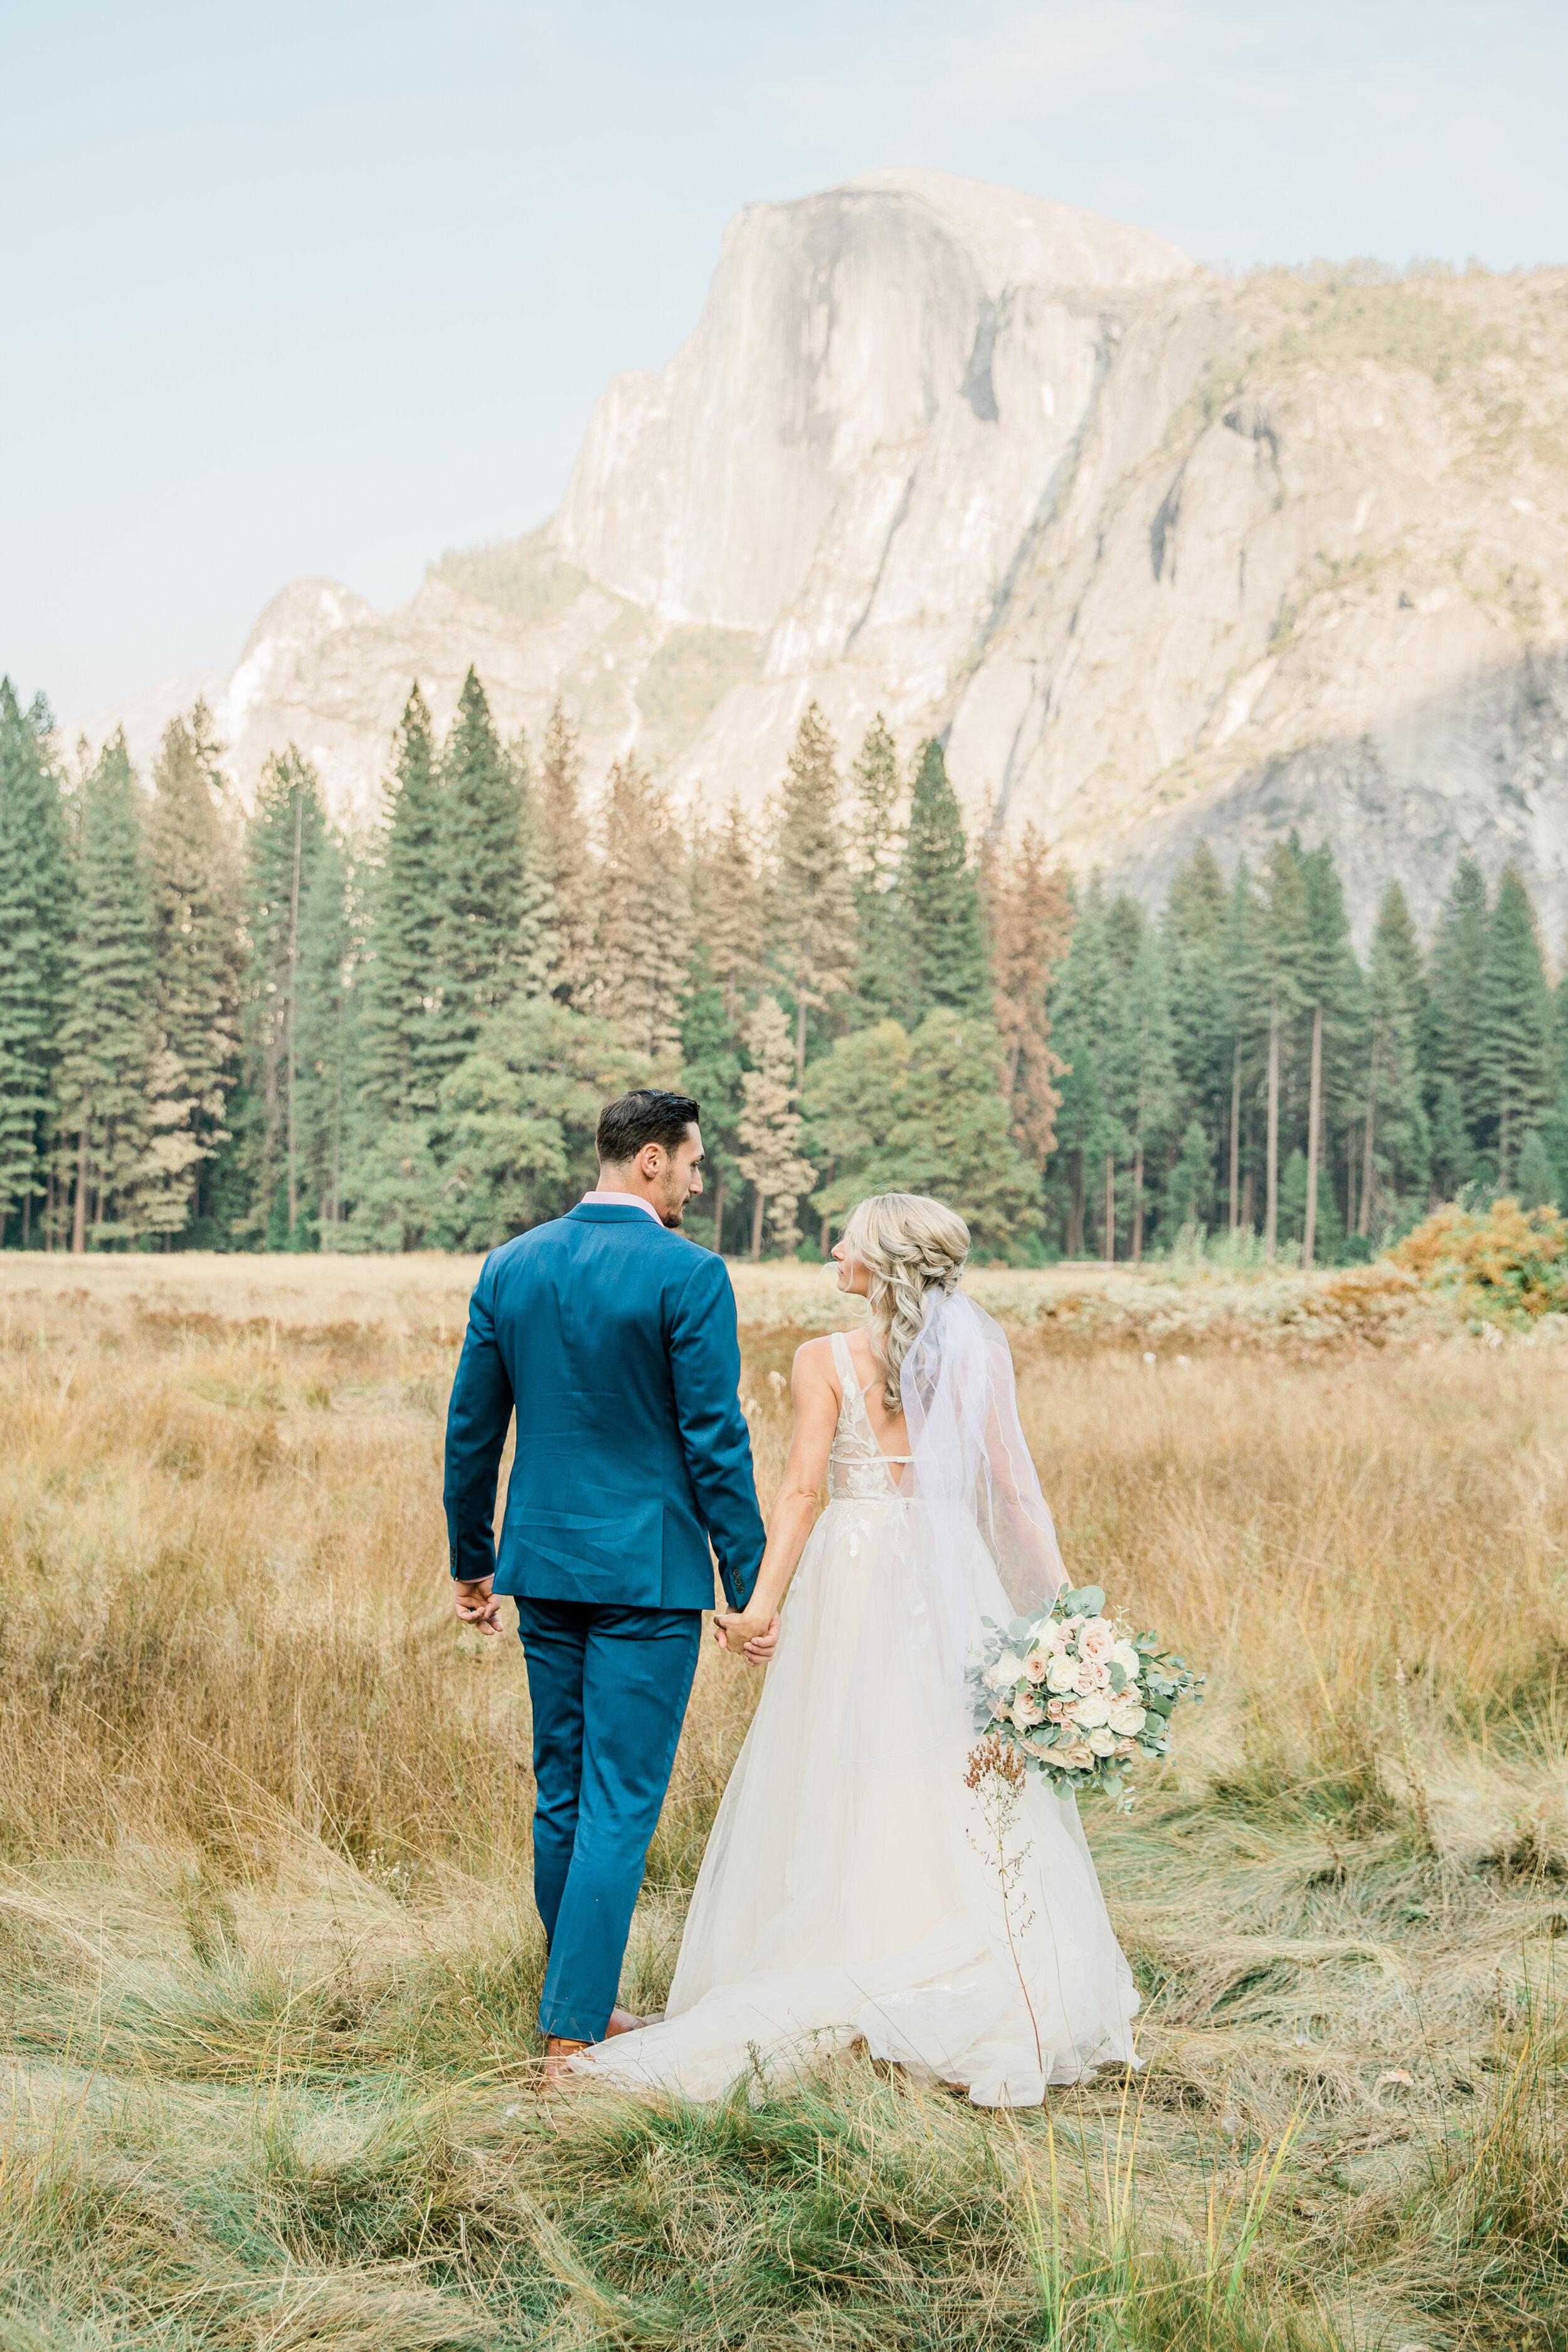 Leanne and Joe - Married - Sneak Peeks - Lauren Alisse Photography-35.jpg